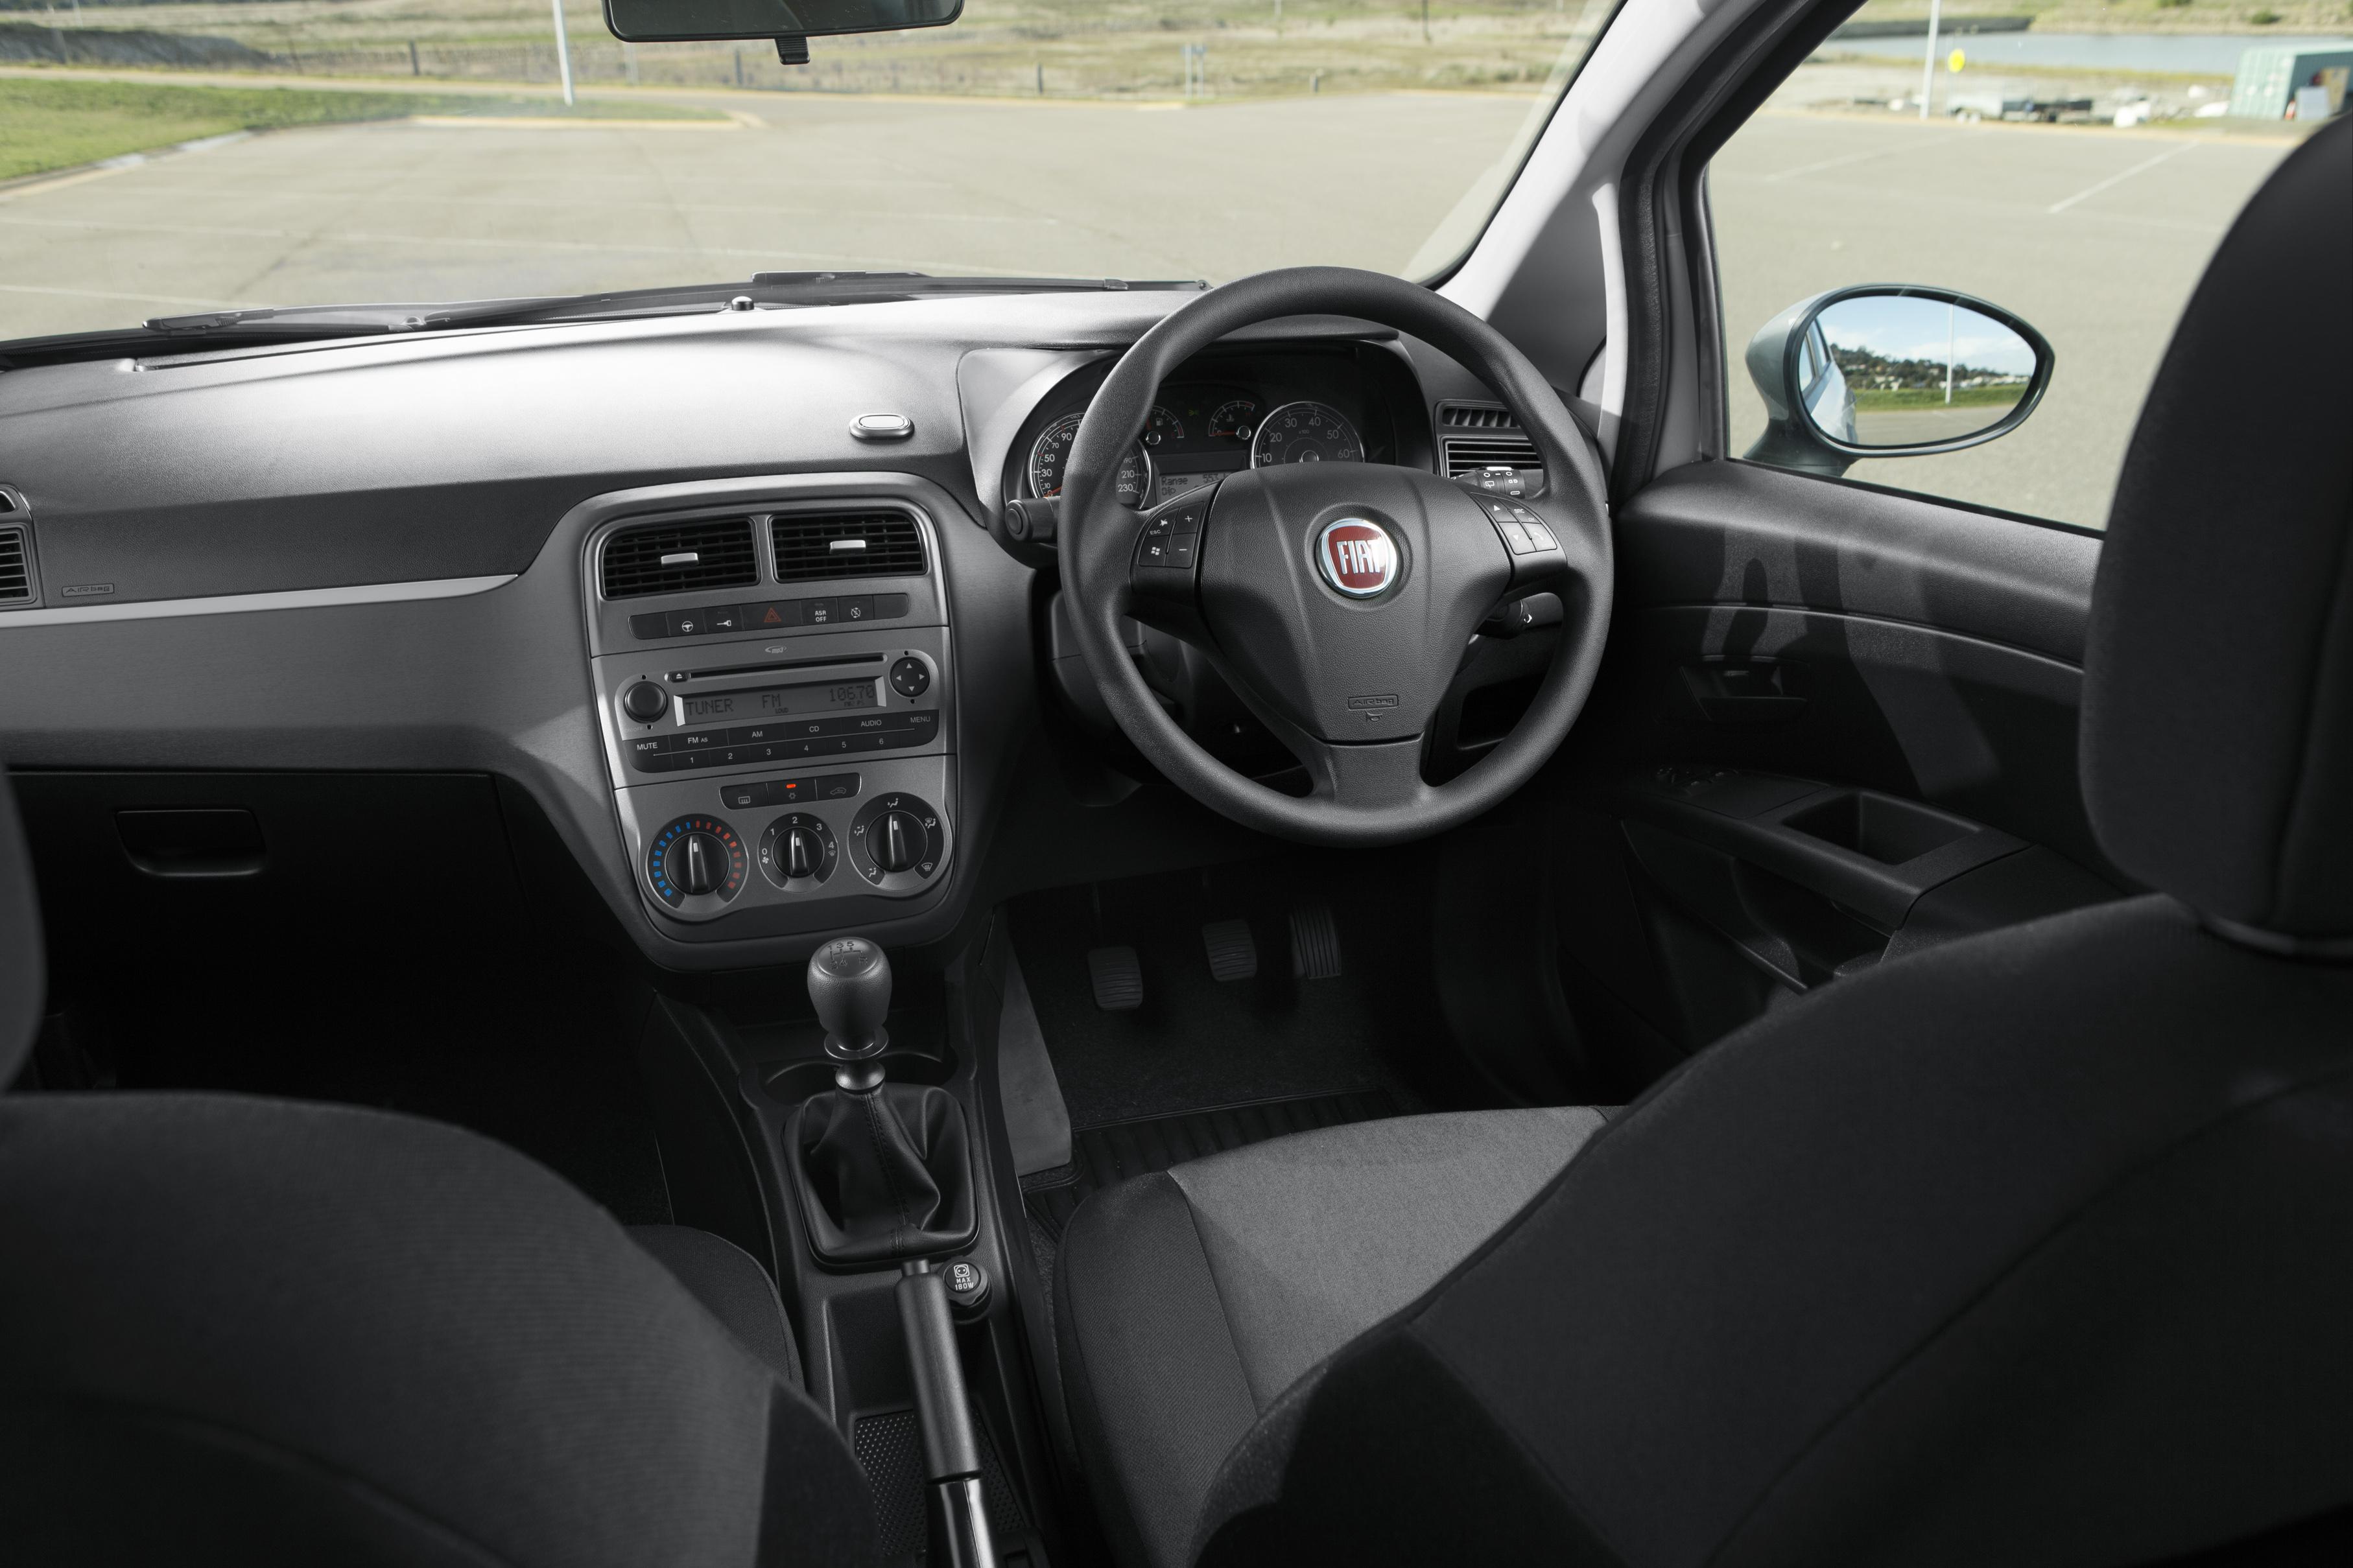 Fiat Punto Pop interior_1a